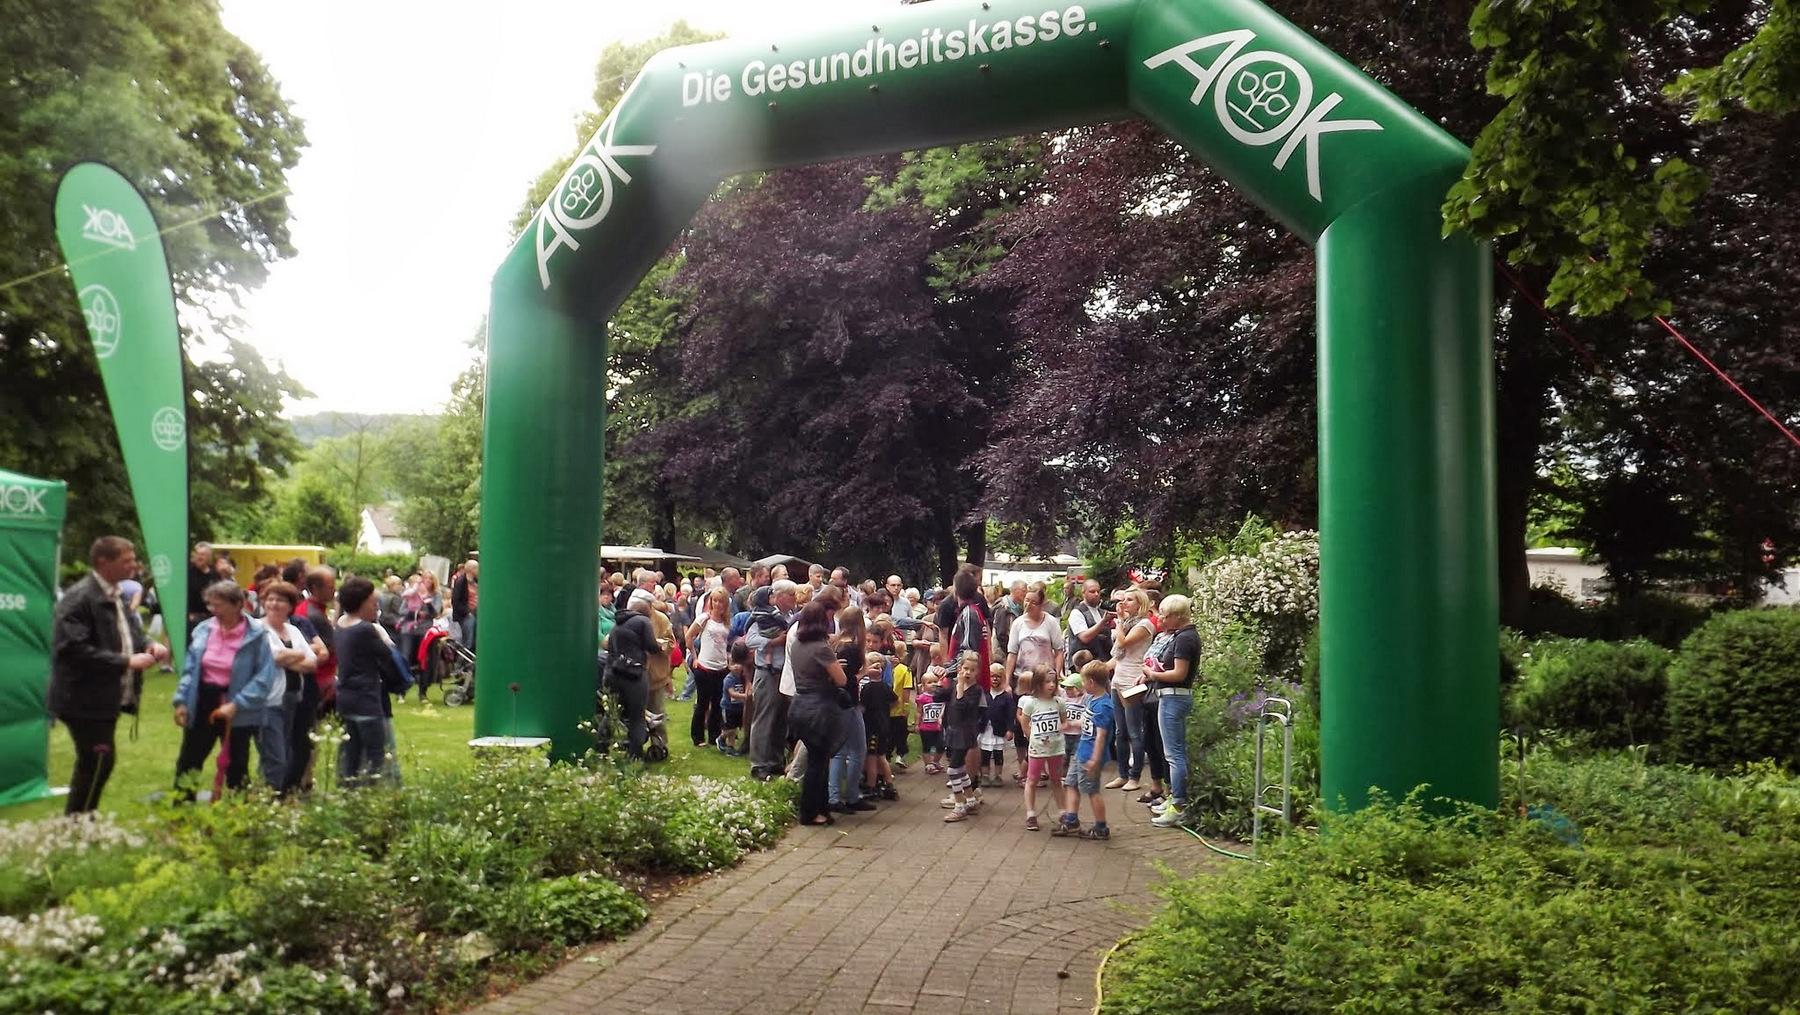 Sponsorenlauf des RSV Barntrup im Barntruper Stadtpark